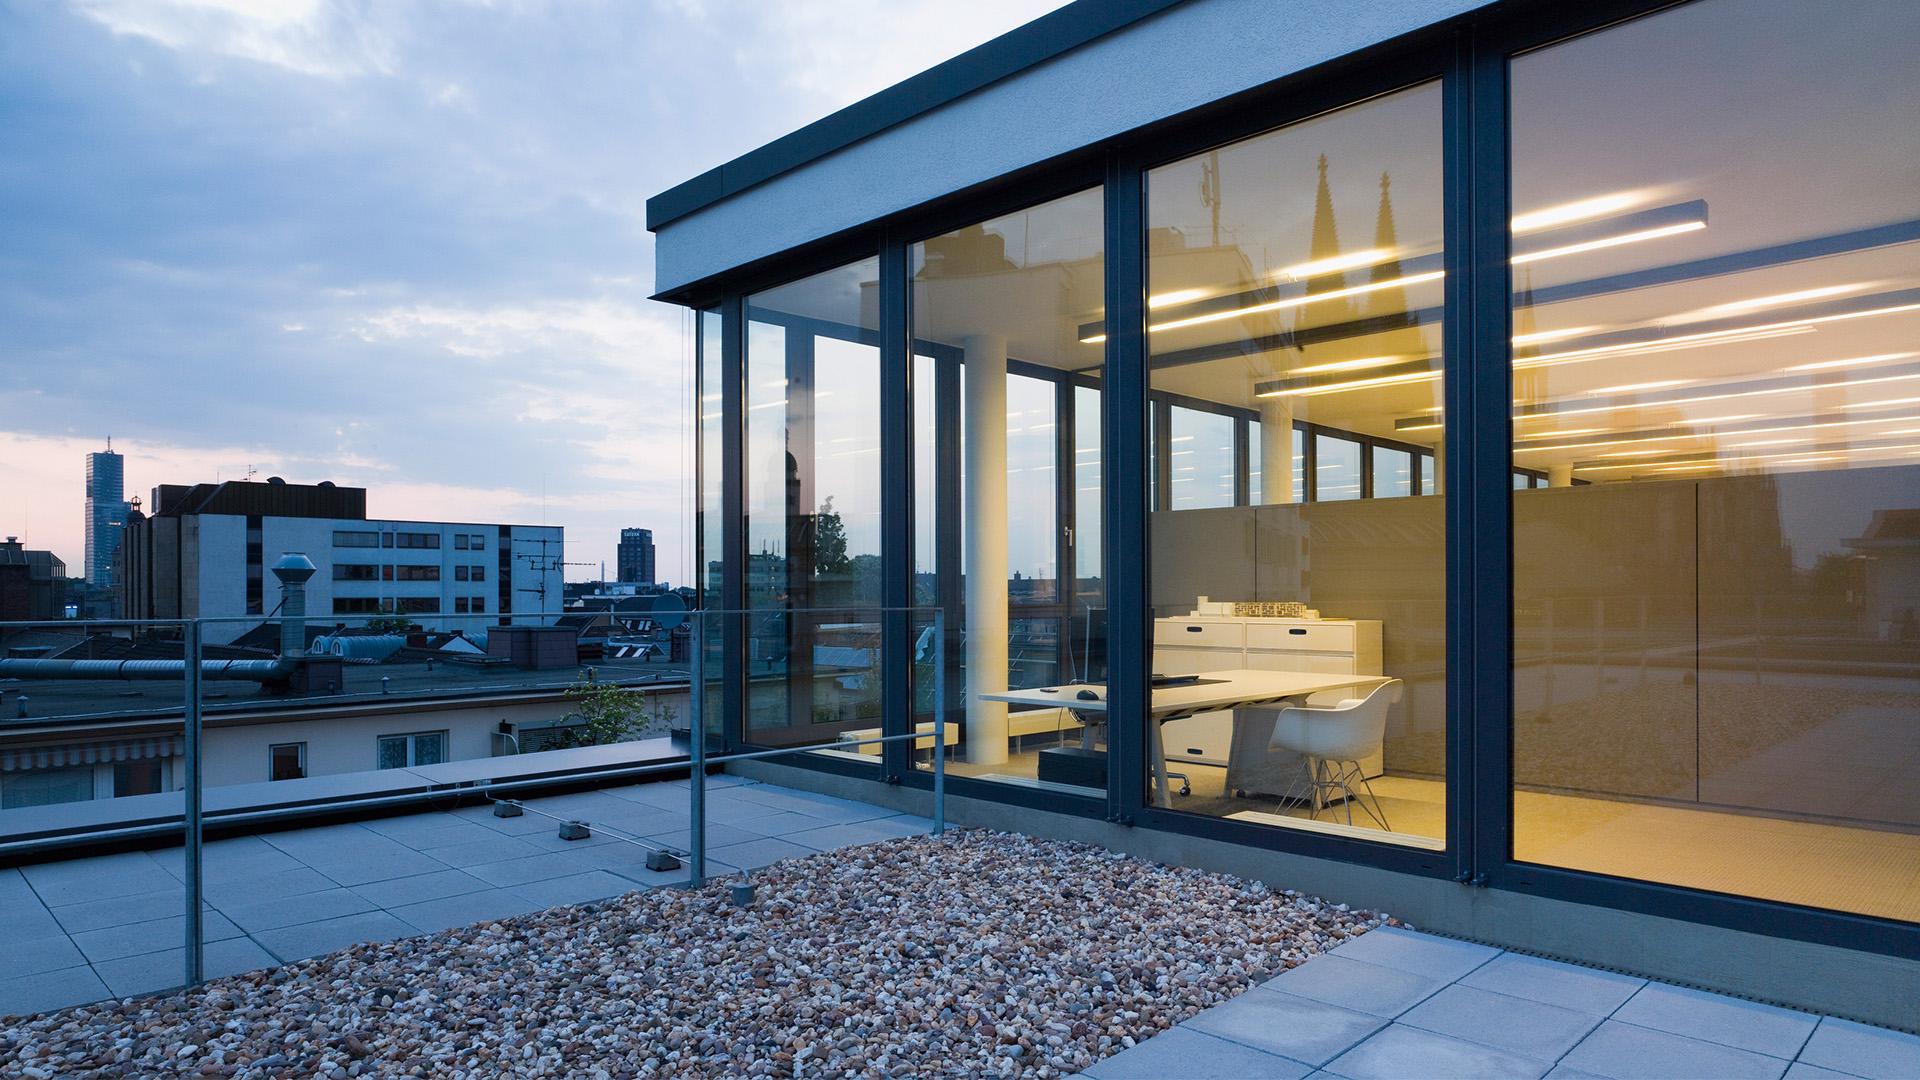 b ro johannisstra e k ln roemerpartner. Black Bedroom Furniture Sets. Home Design Ideas